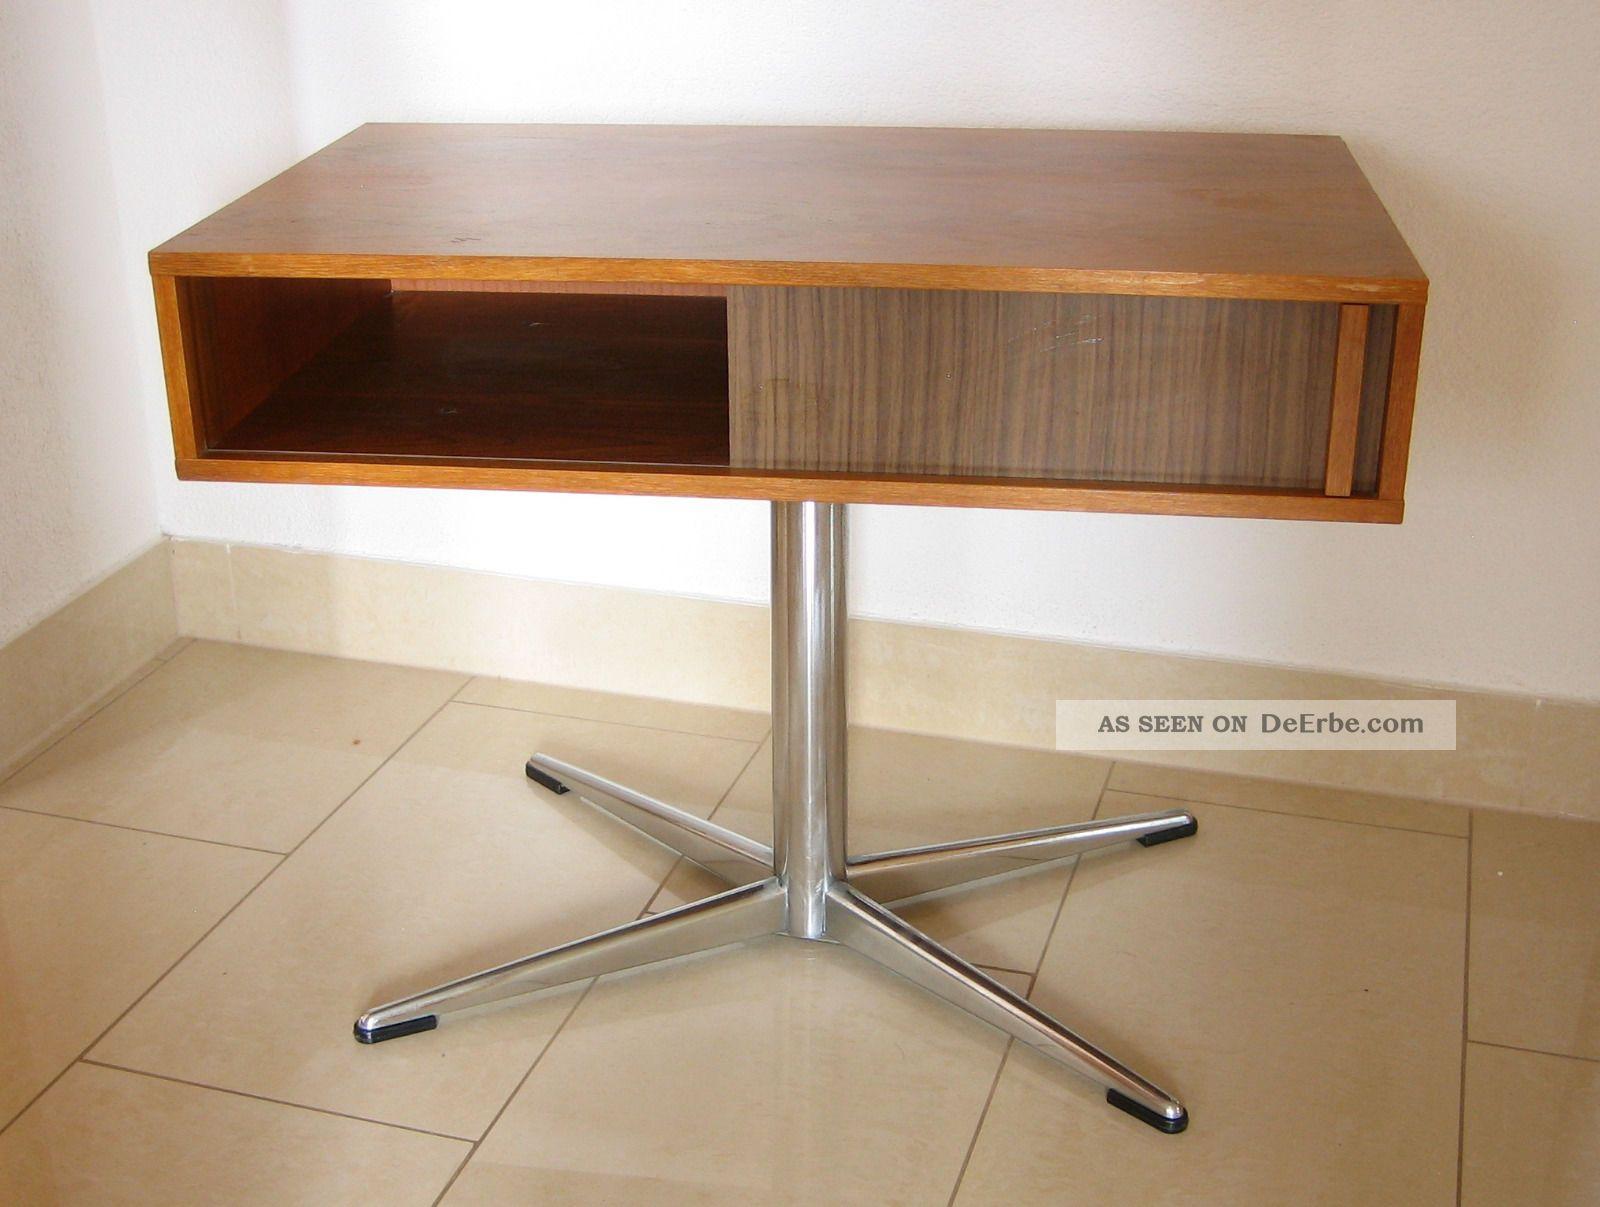 70er jahre chrom fernsehtisch fehrnsehschrank klassiker. Black Bedroom Furniture Sets. Home Design Ideas